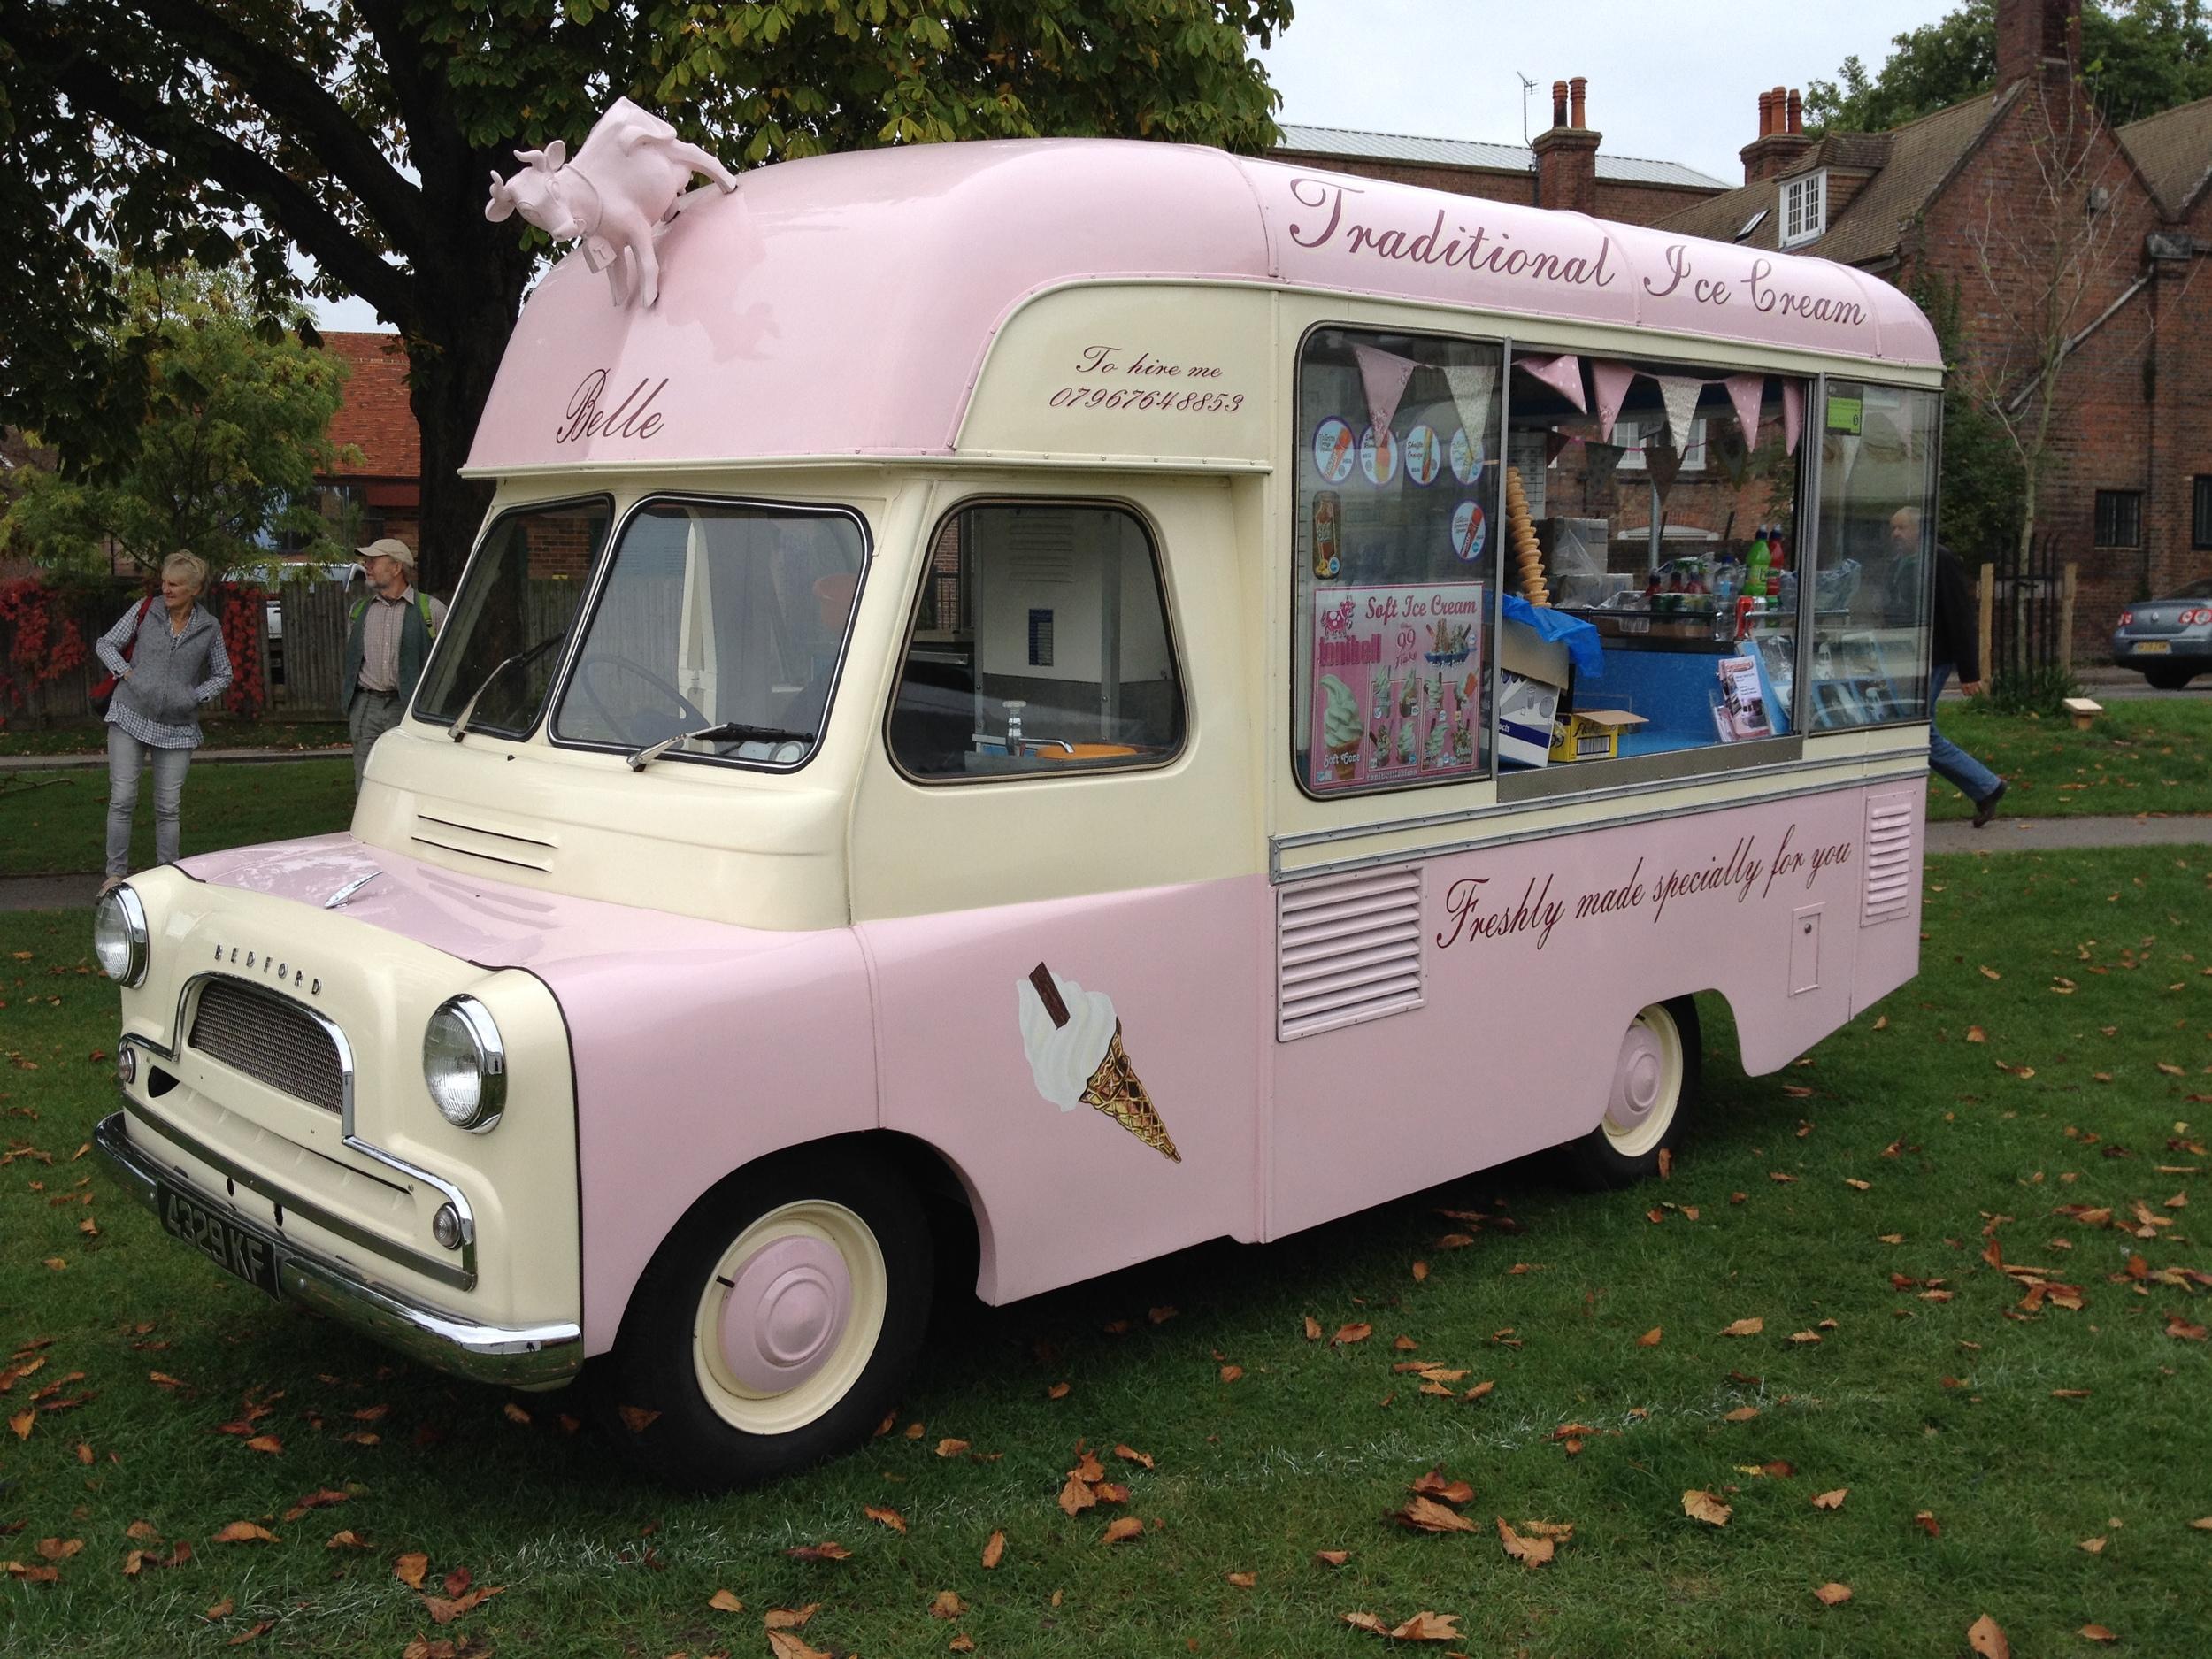 Belle - Vintage ice cream van, Kent